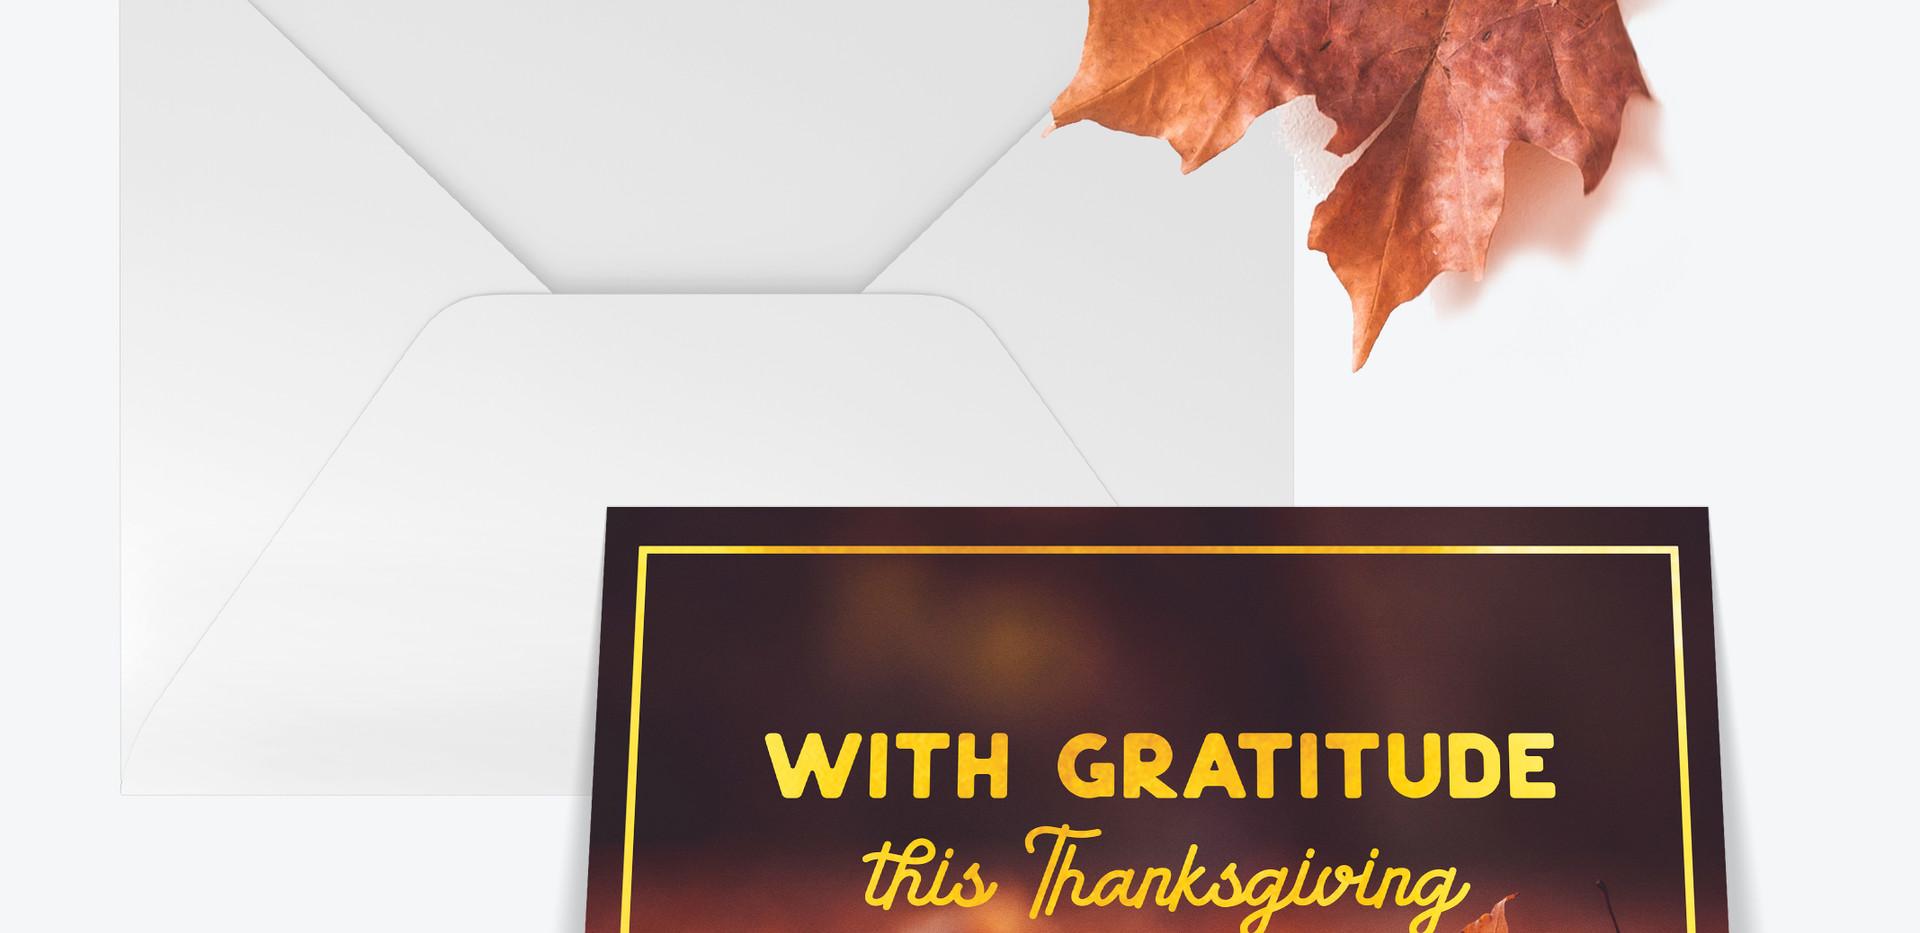 TG Gratitude